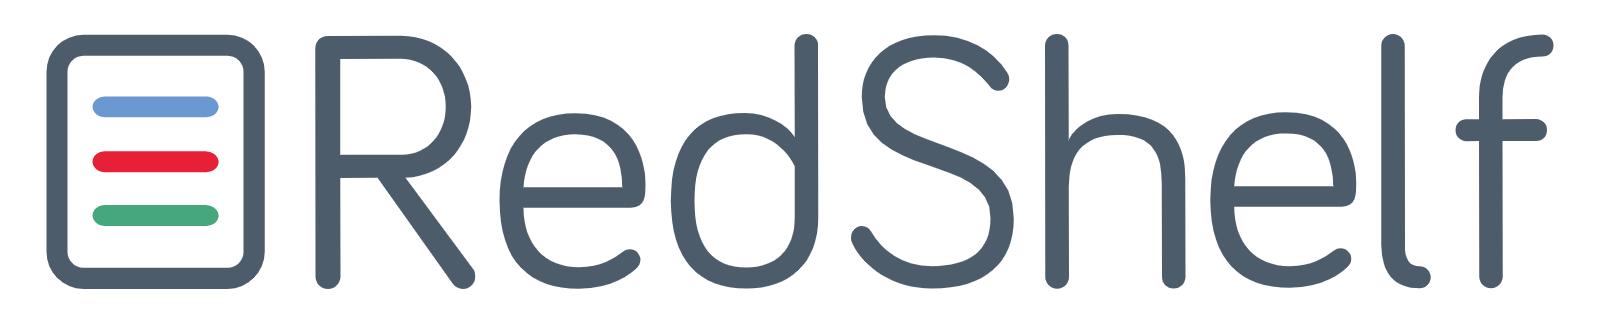 RedShelf Coupons Reddit 2021 September 2021